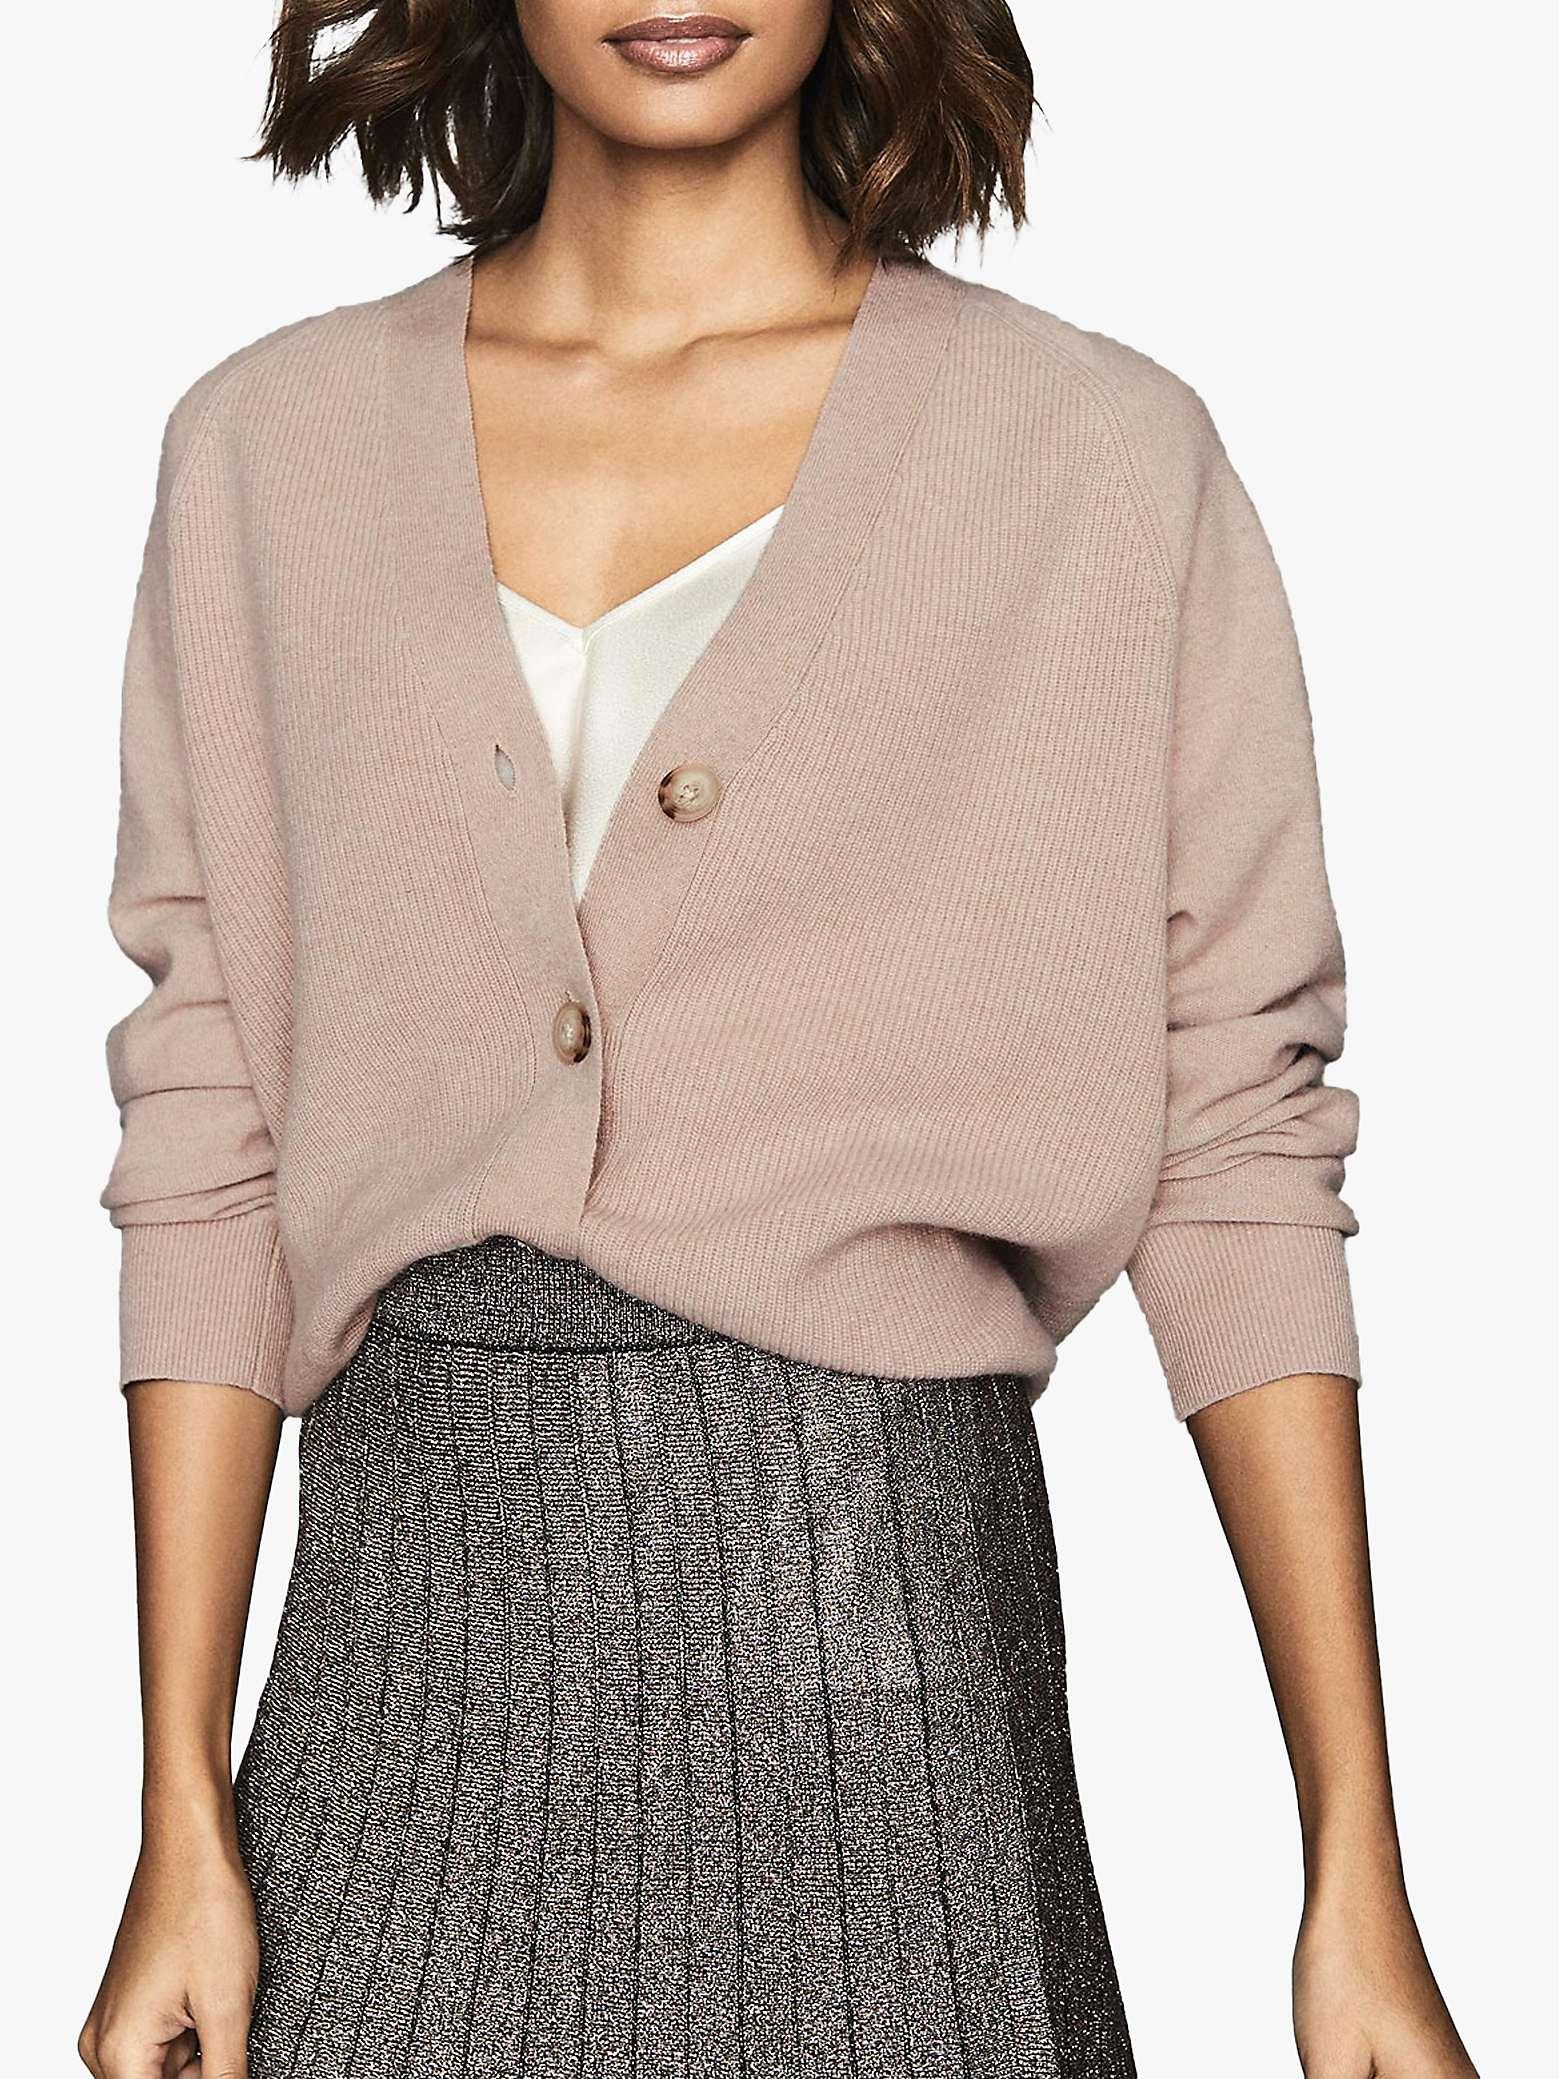 reiss-simone-wool-cashmere-blend-cardigan,-blush by john-lewis